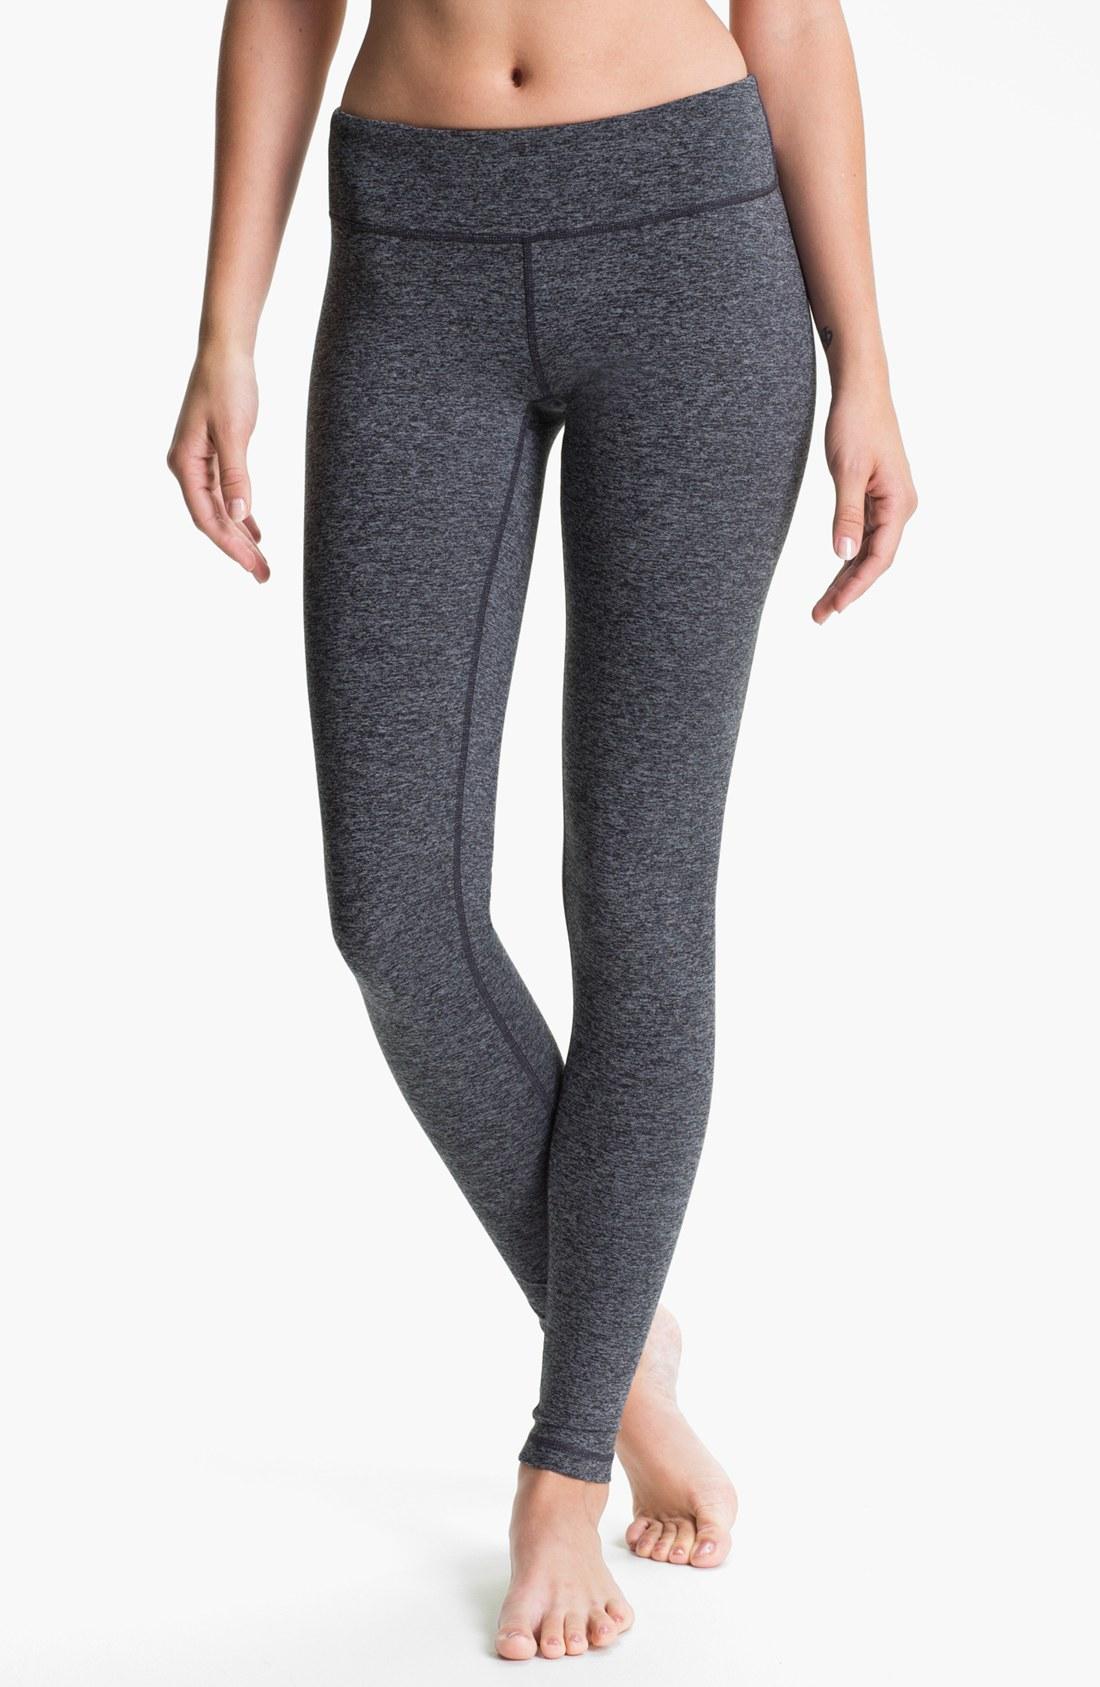 comfortable leggings for fitness exercise